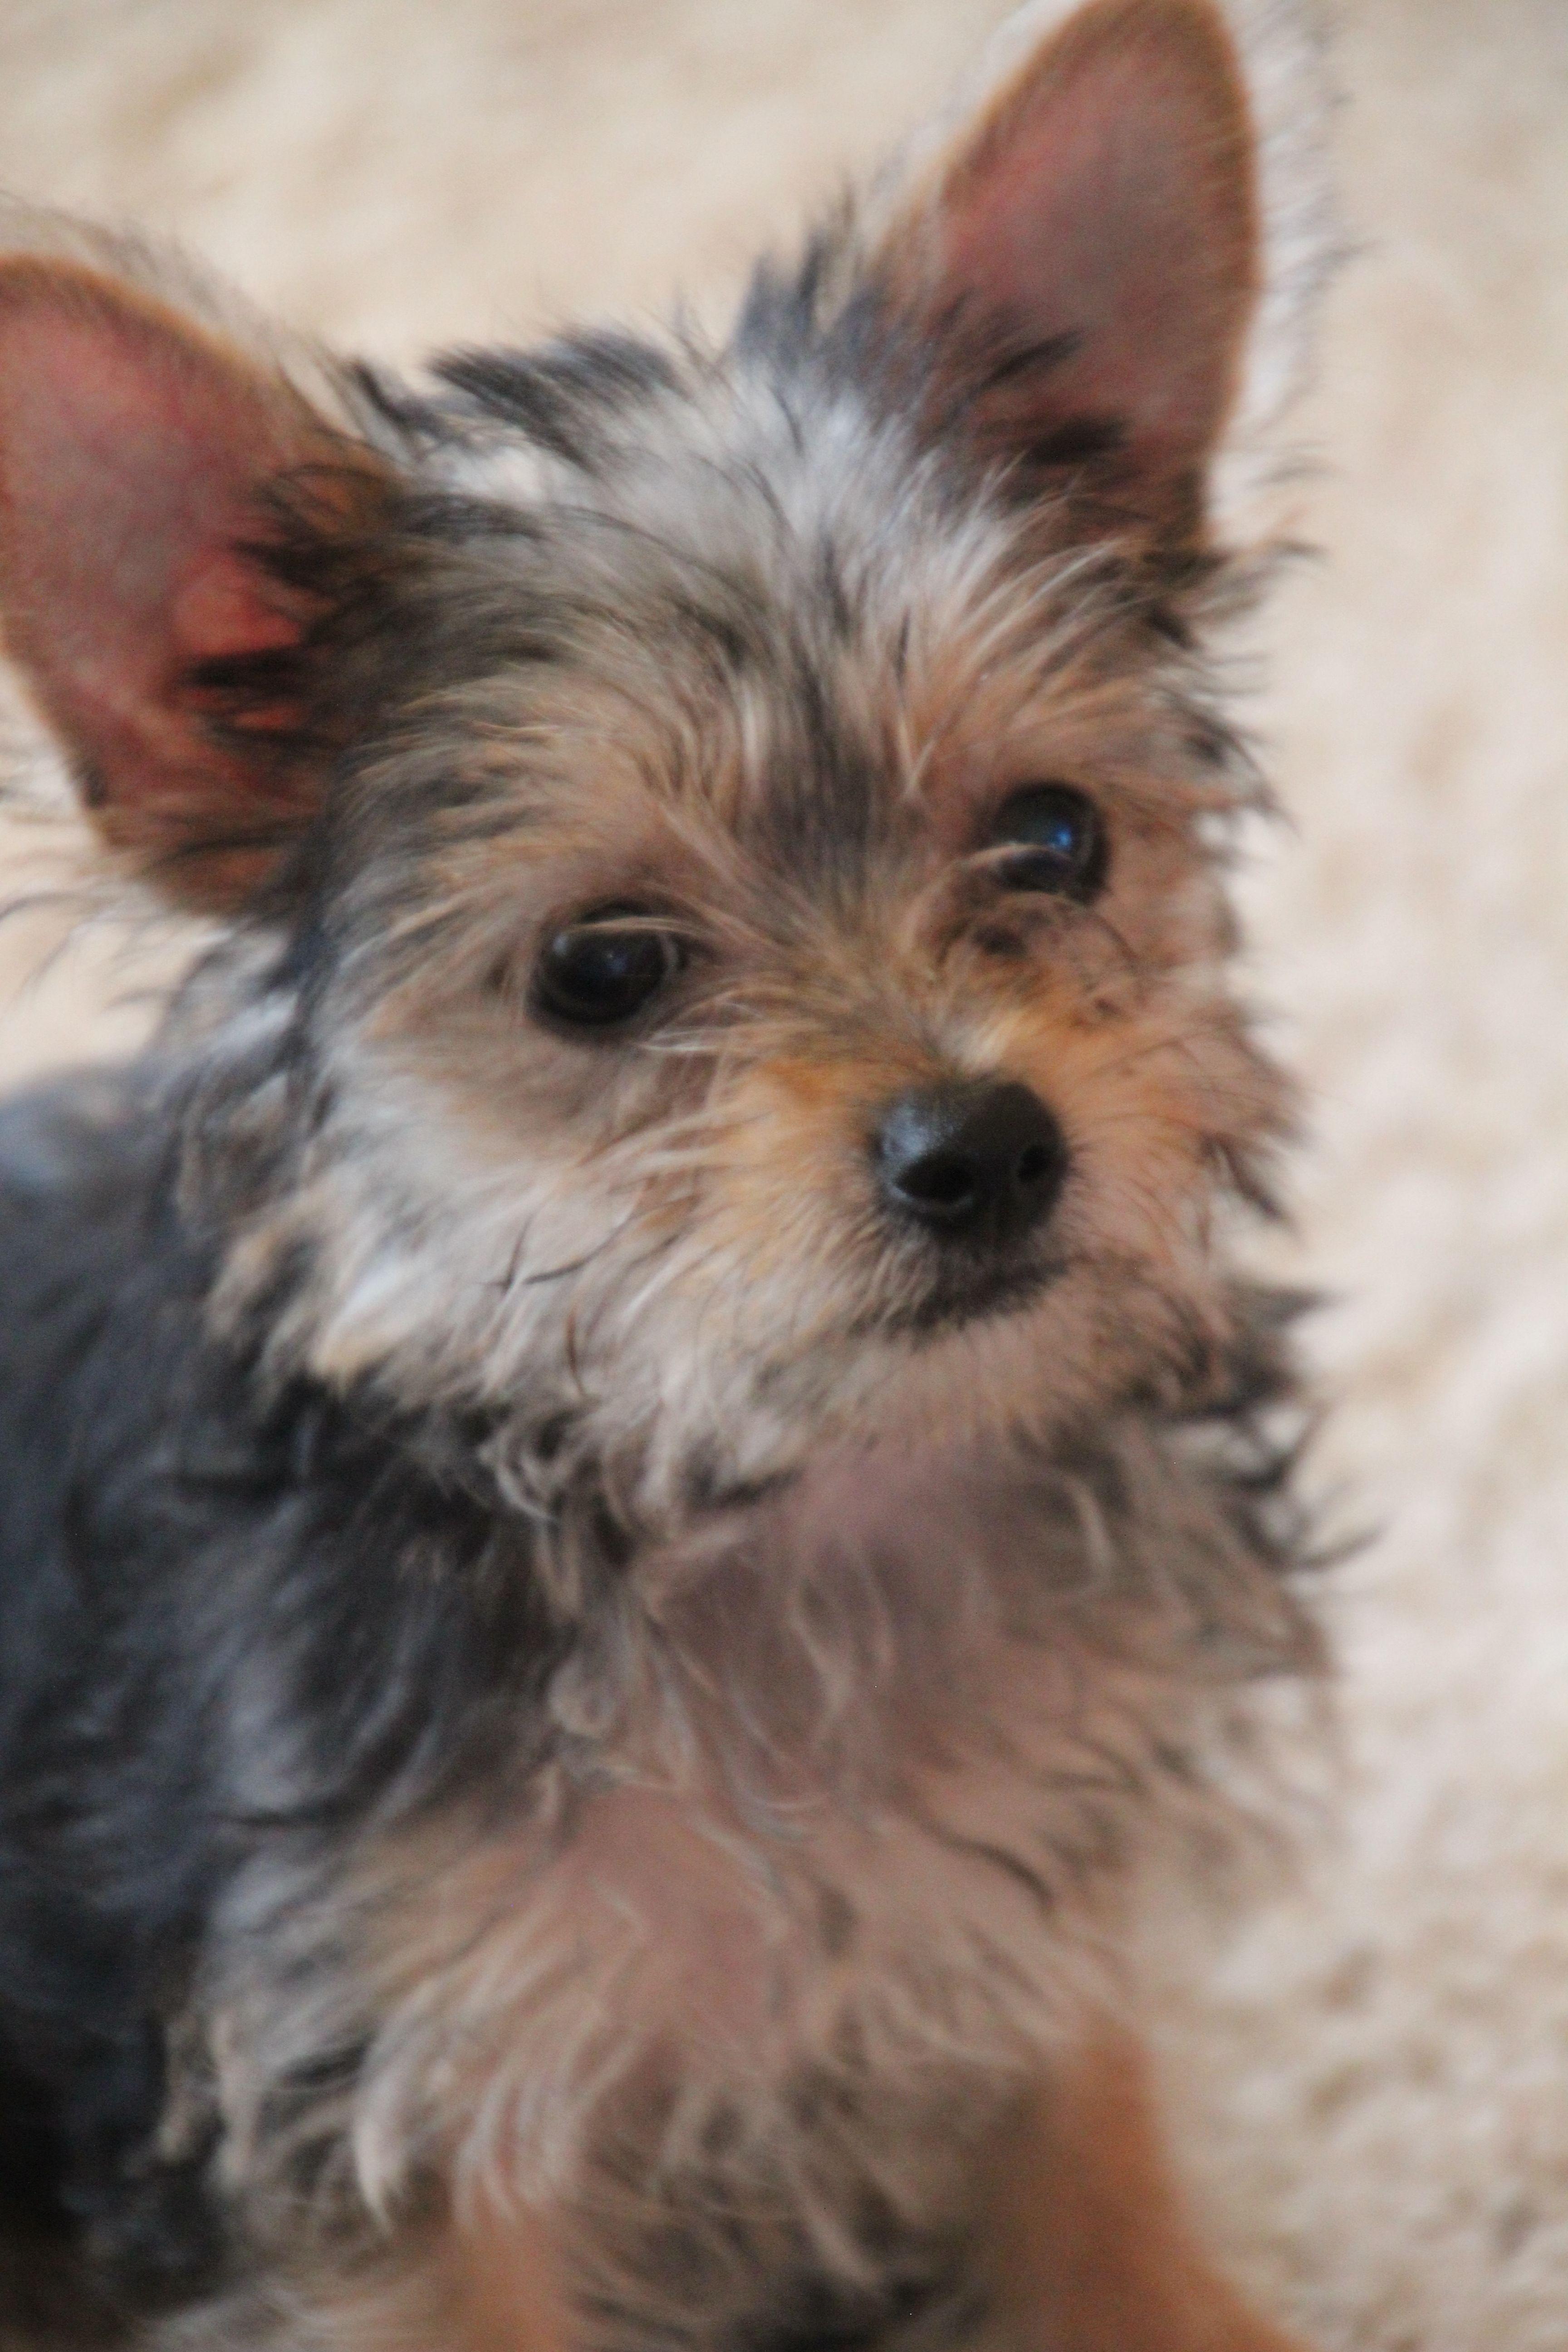 I just want my small doggie... chorkie Doggies